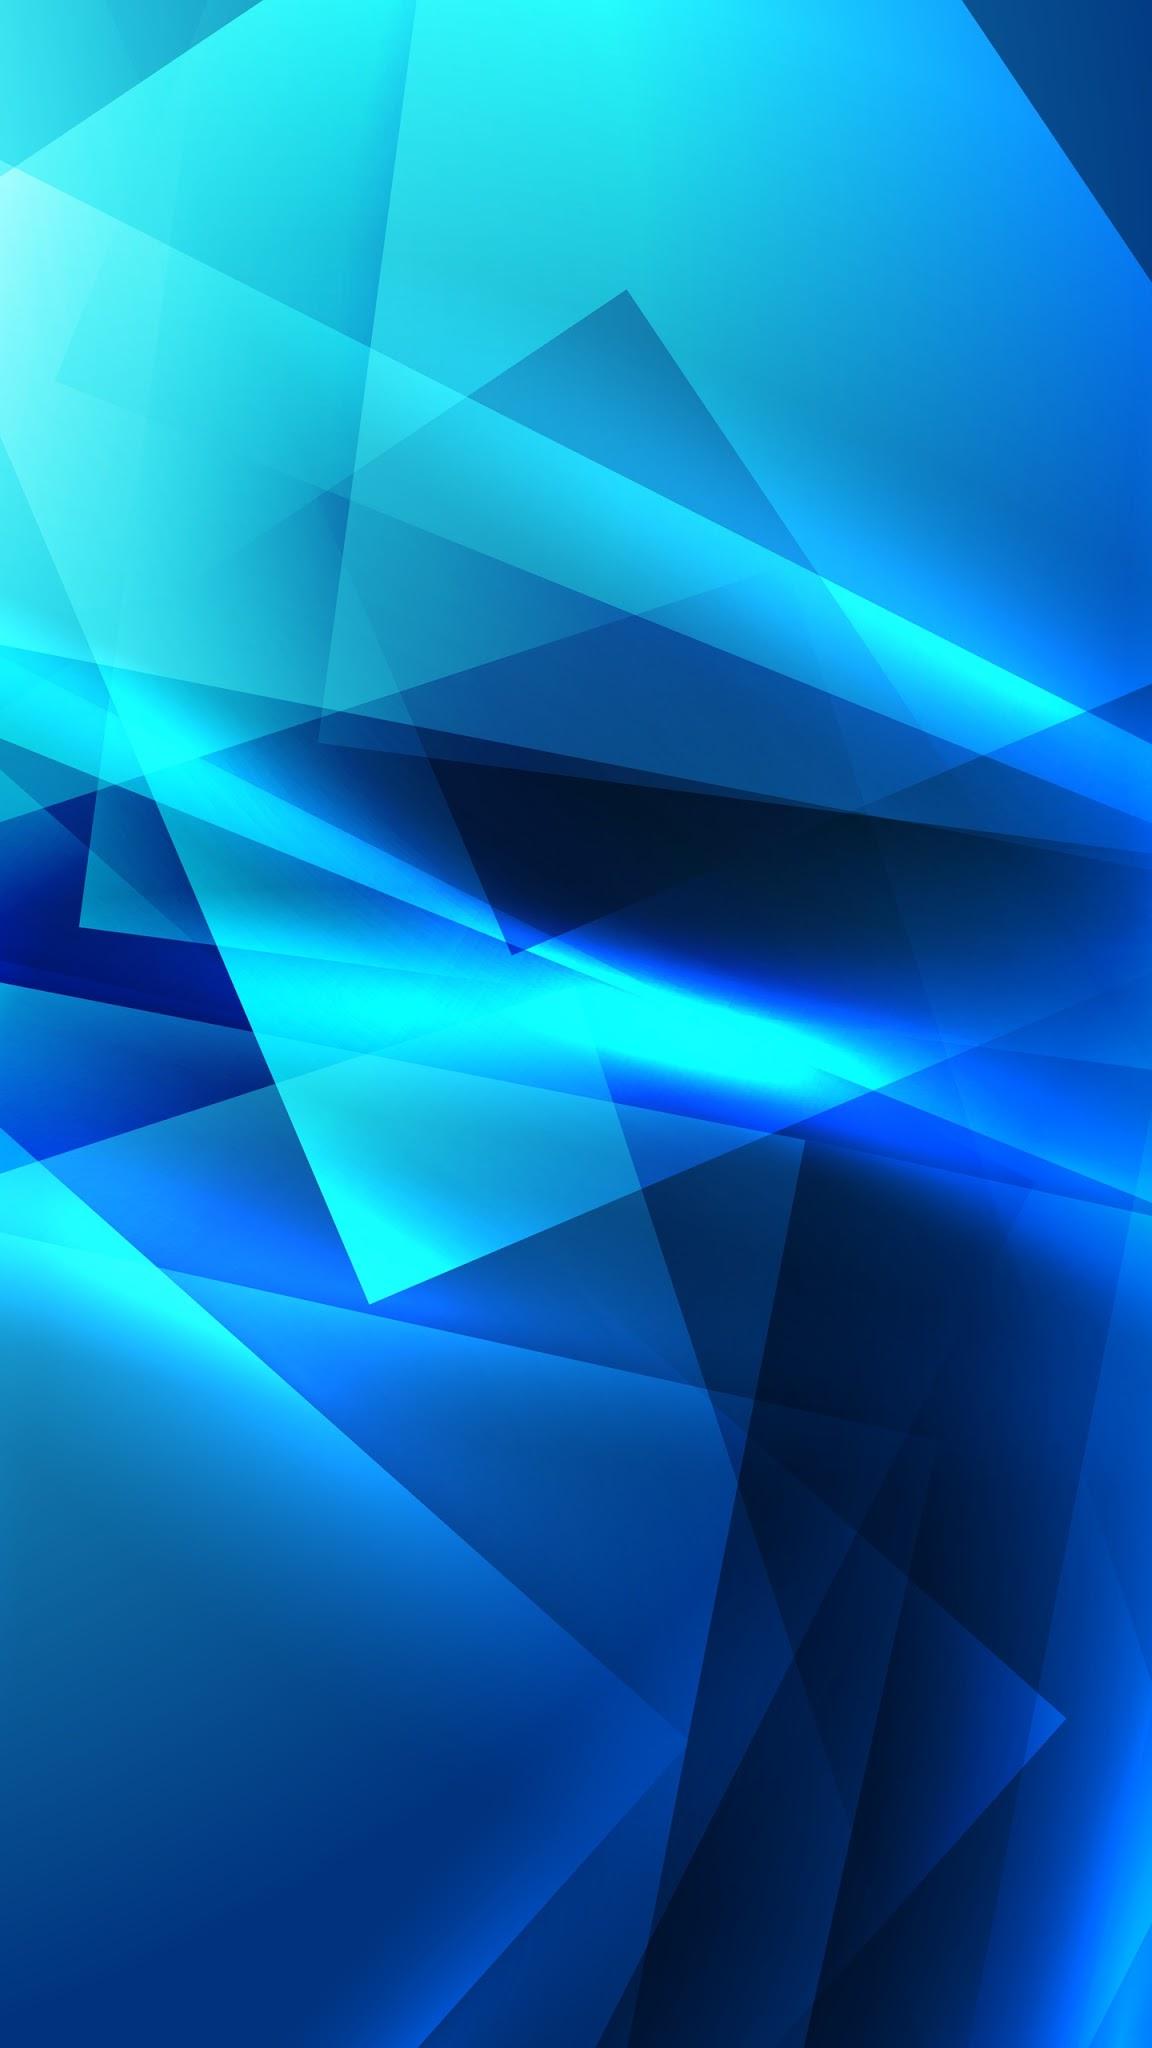 fond d'écran samsung galaxy j5